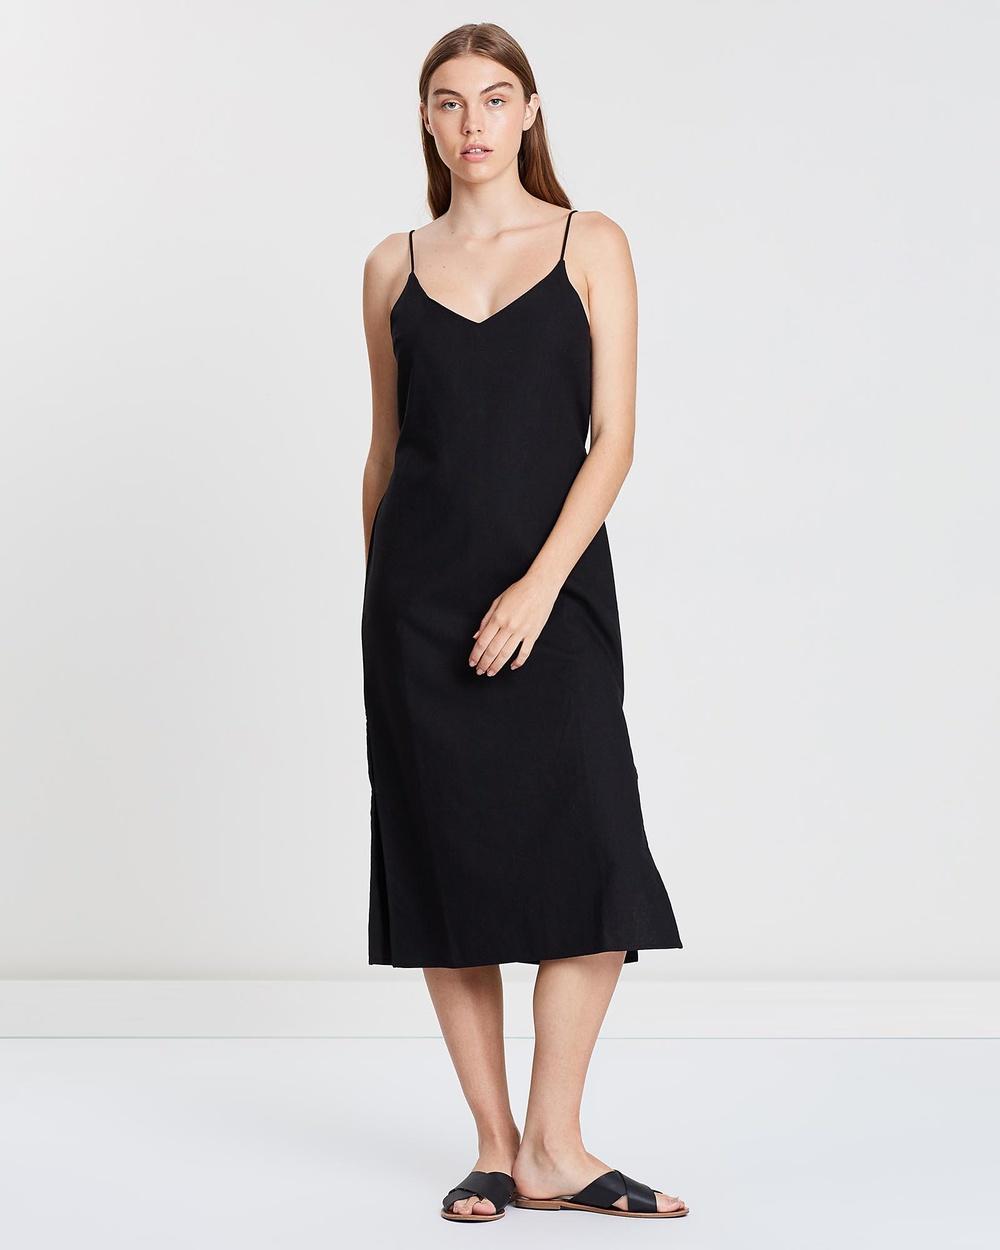 Elwood Black Kennedy Slip Dress